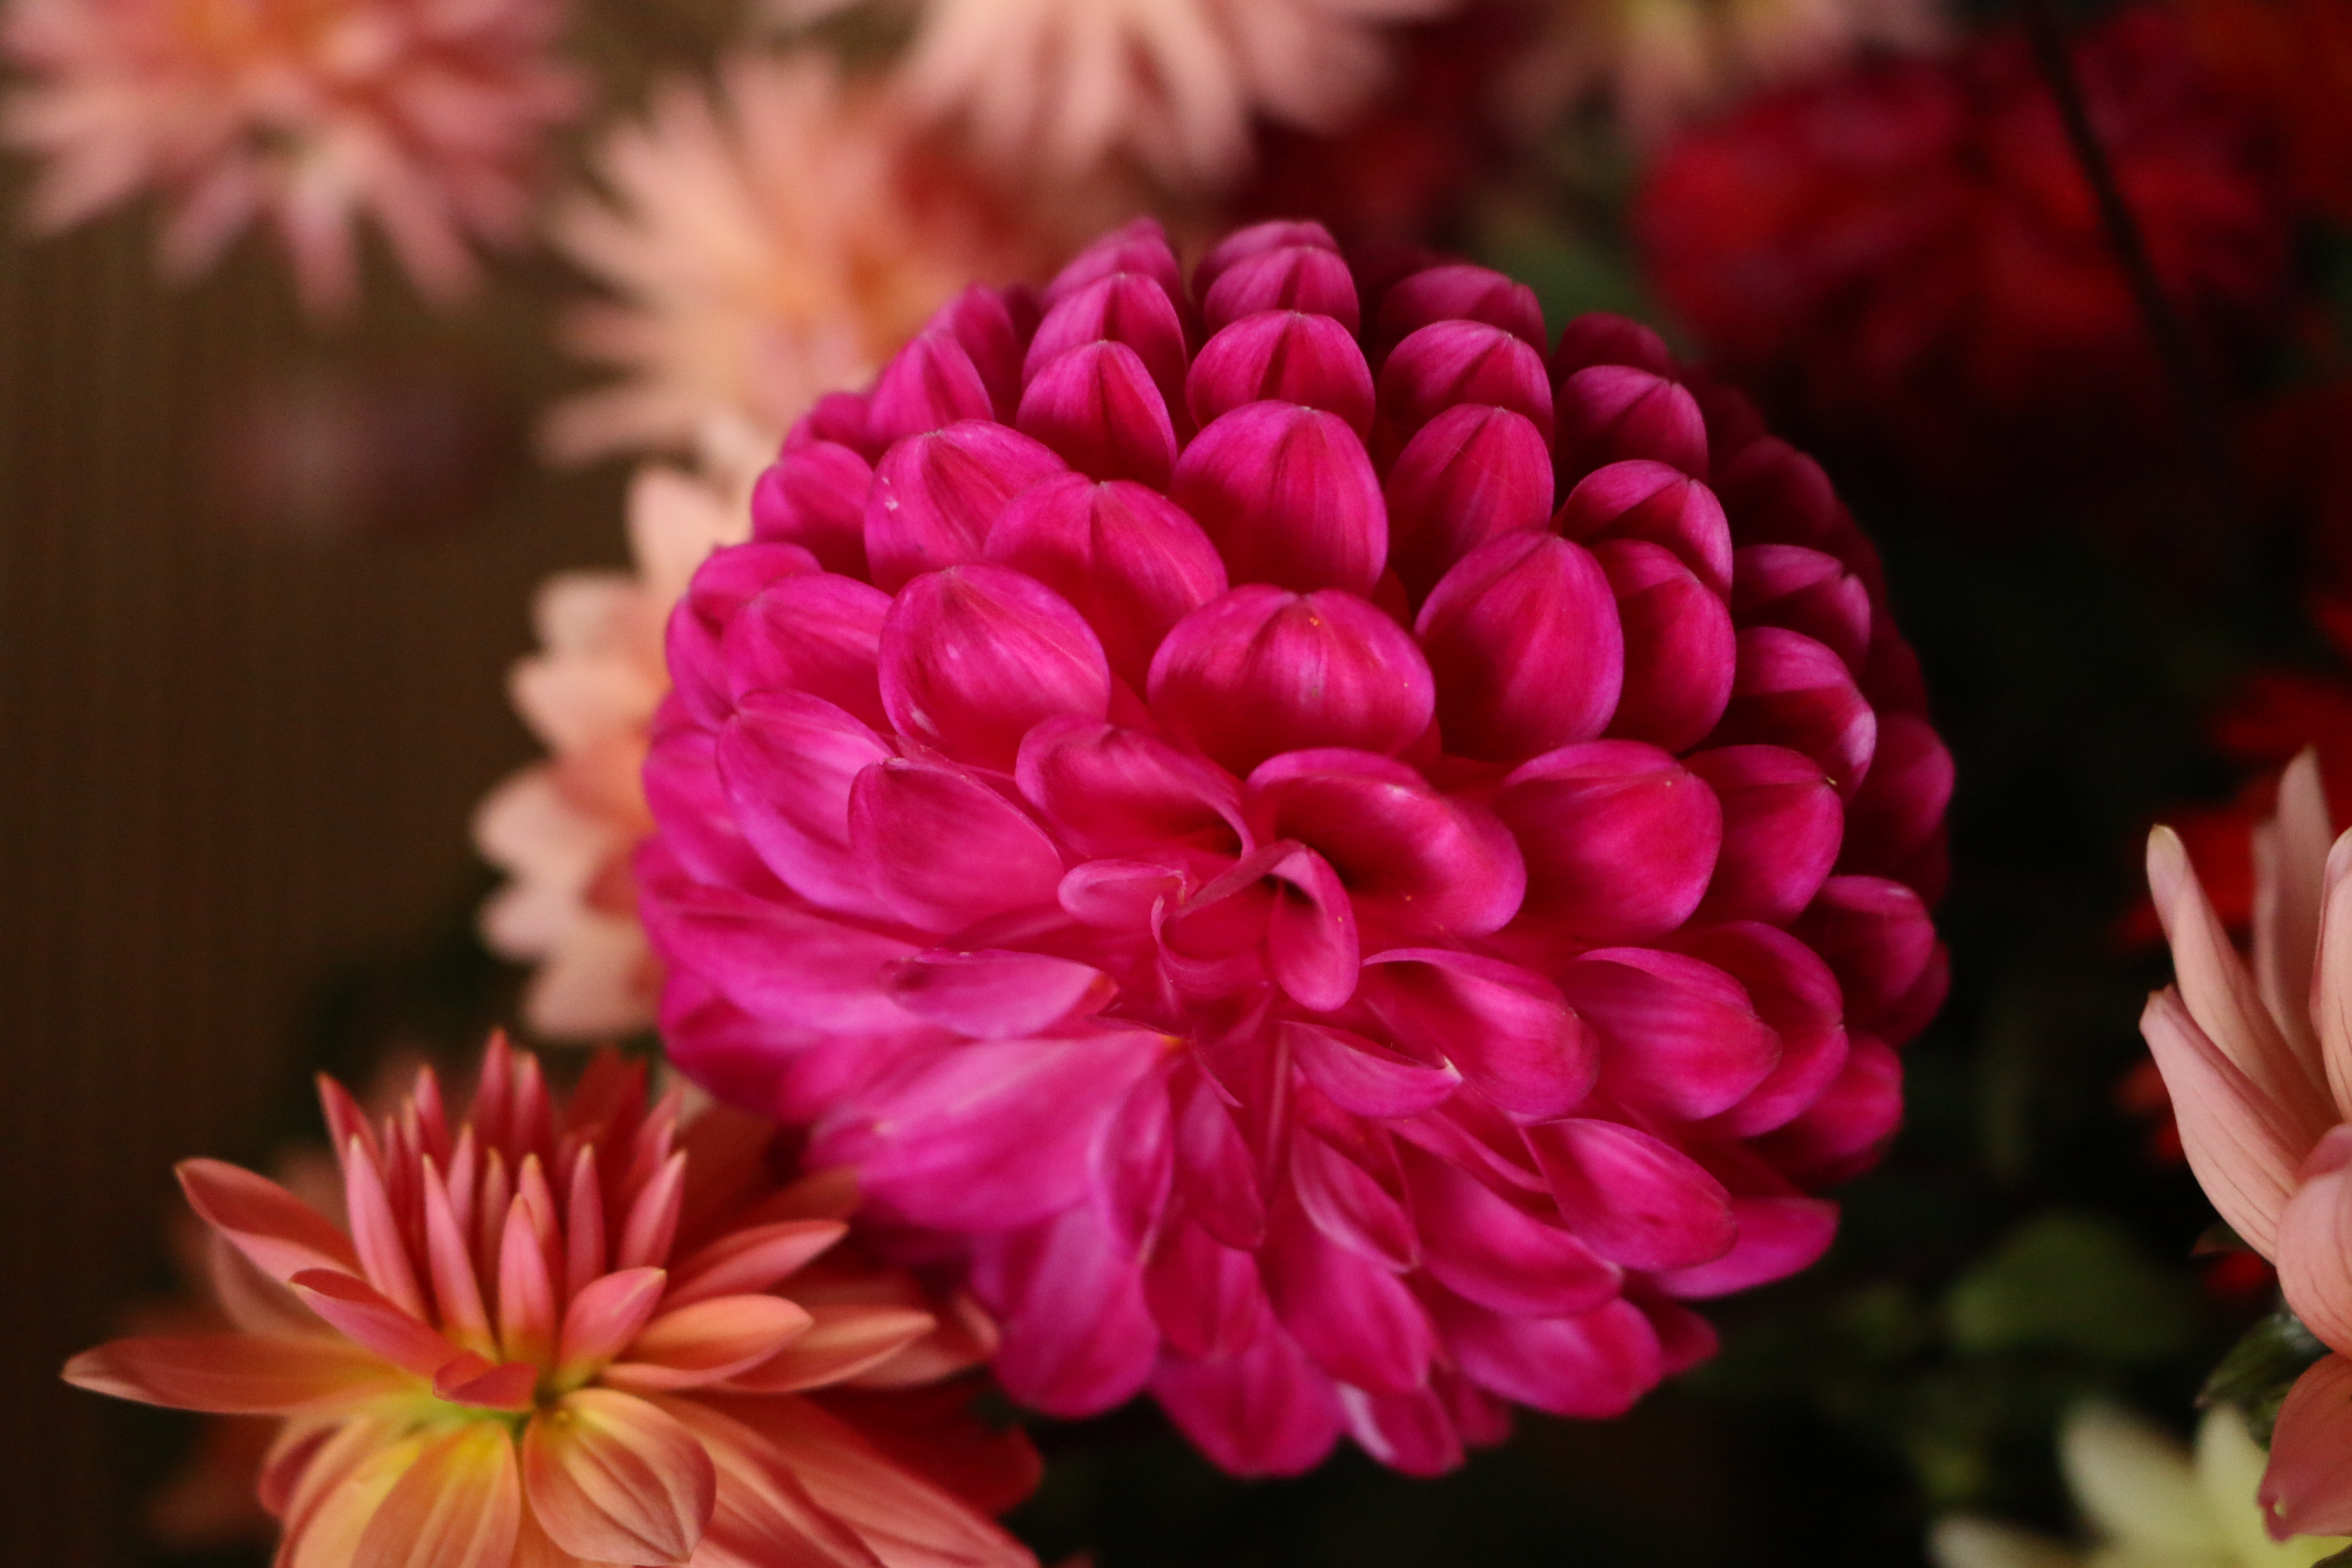 Flower power 5